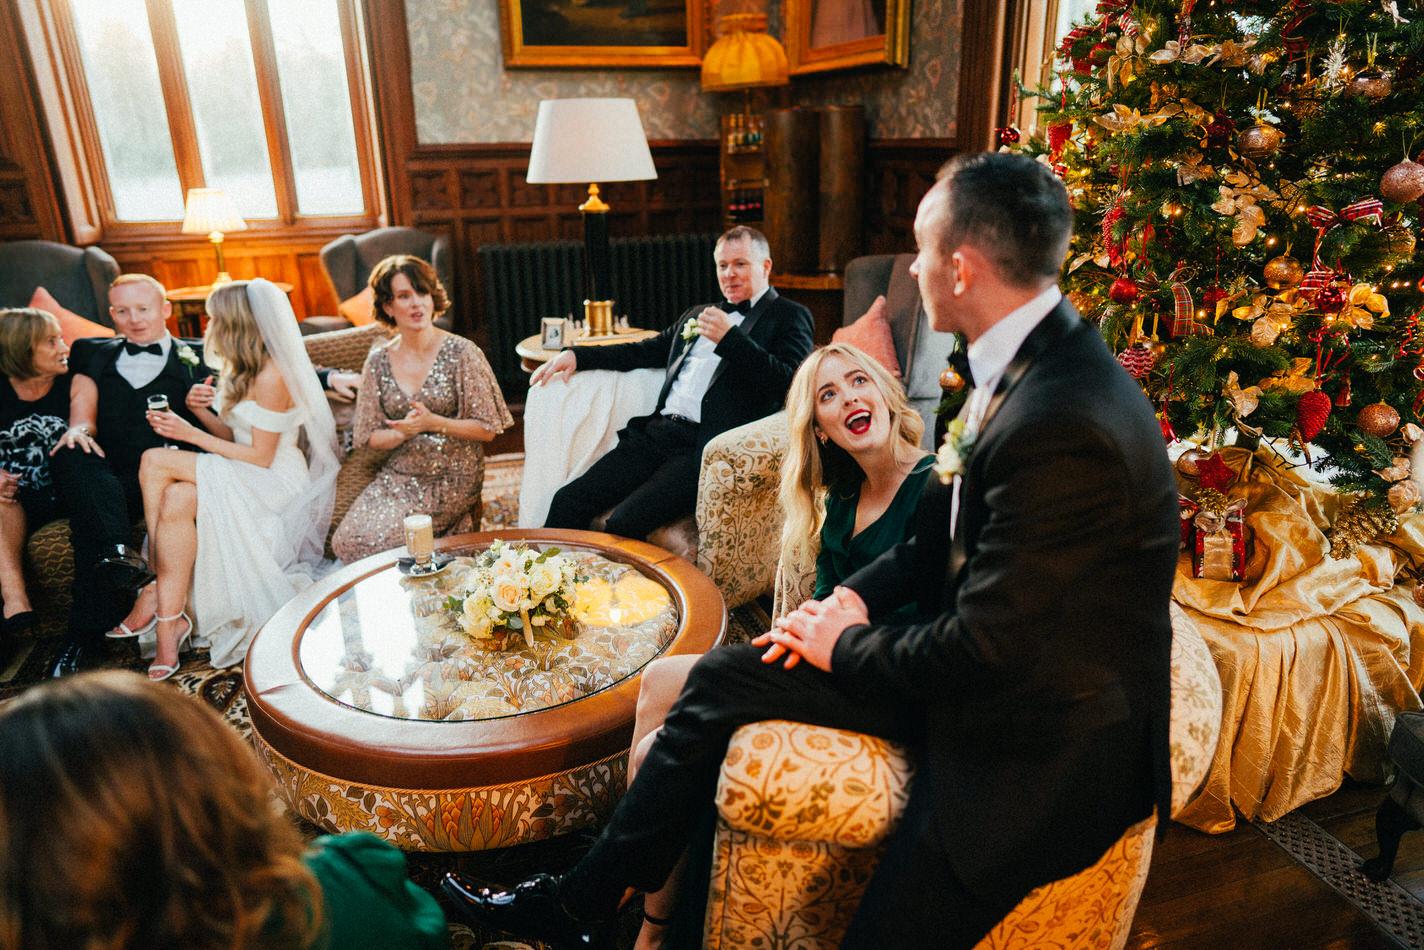 Castle-wedding-ireland-photos- 0238 177